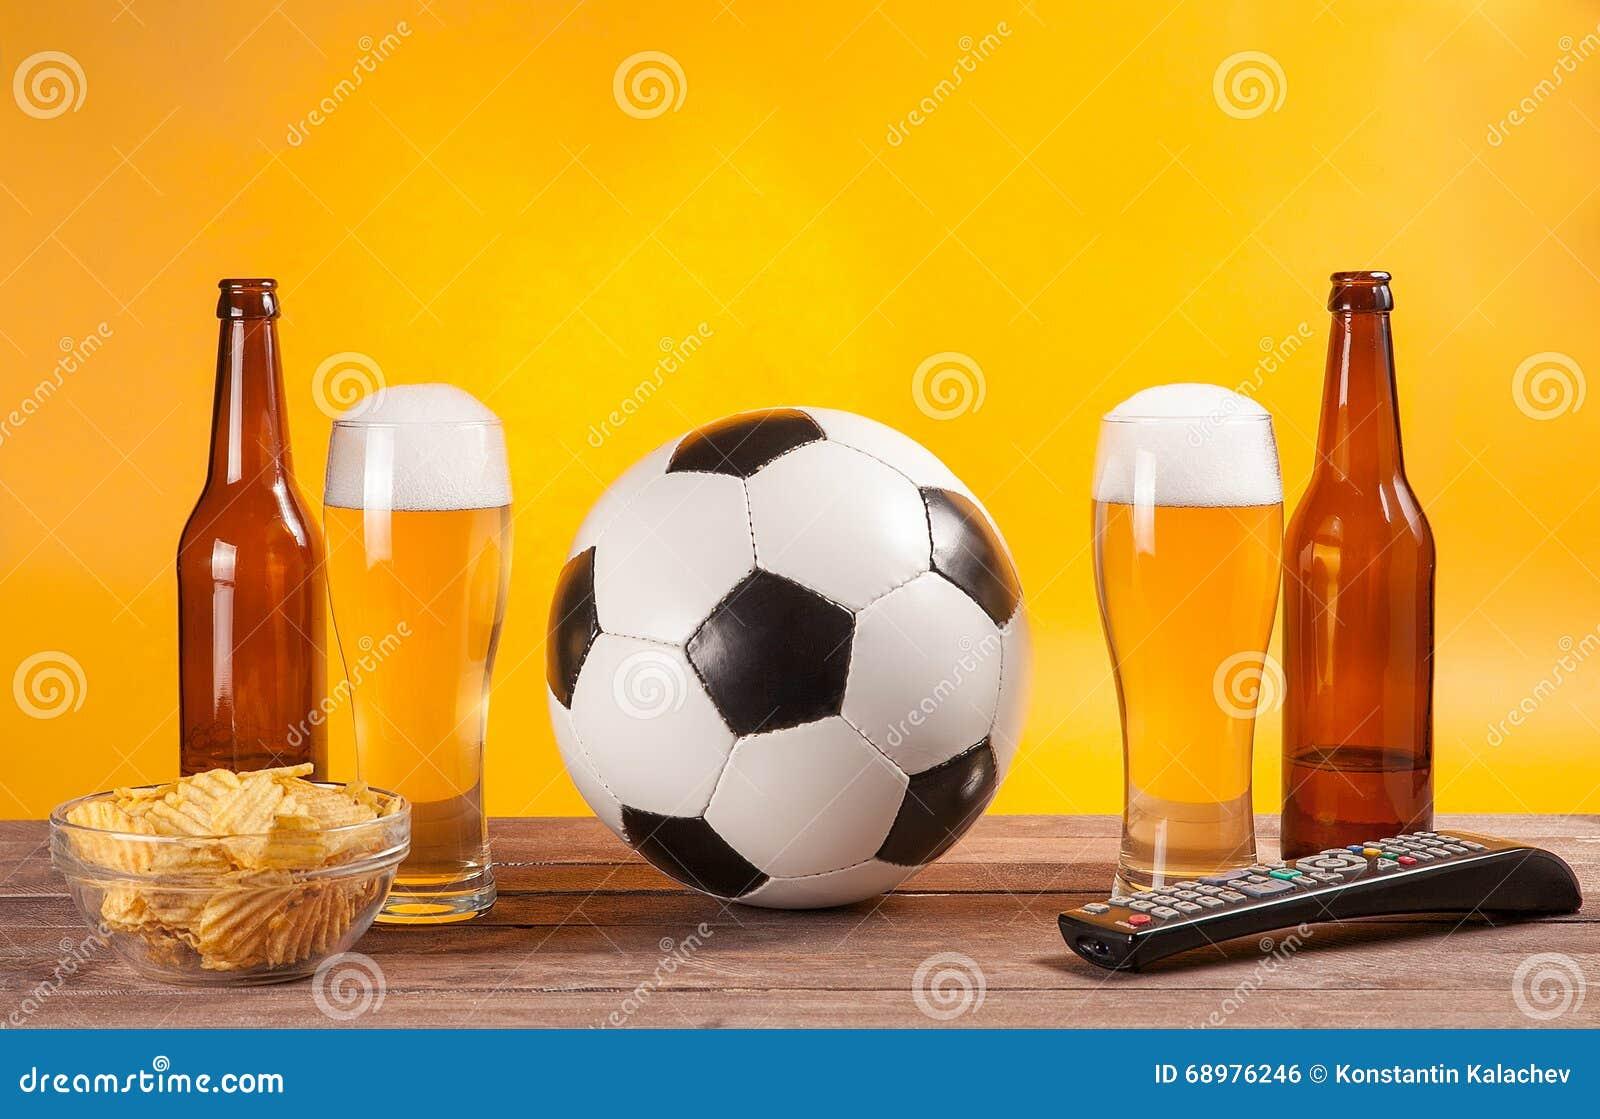 Glas met bier en voetbalbal dichtbij verre TV